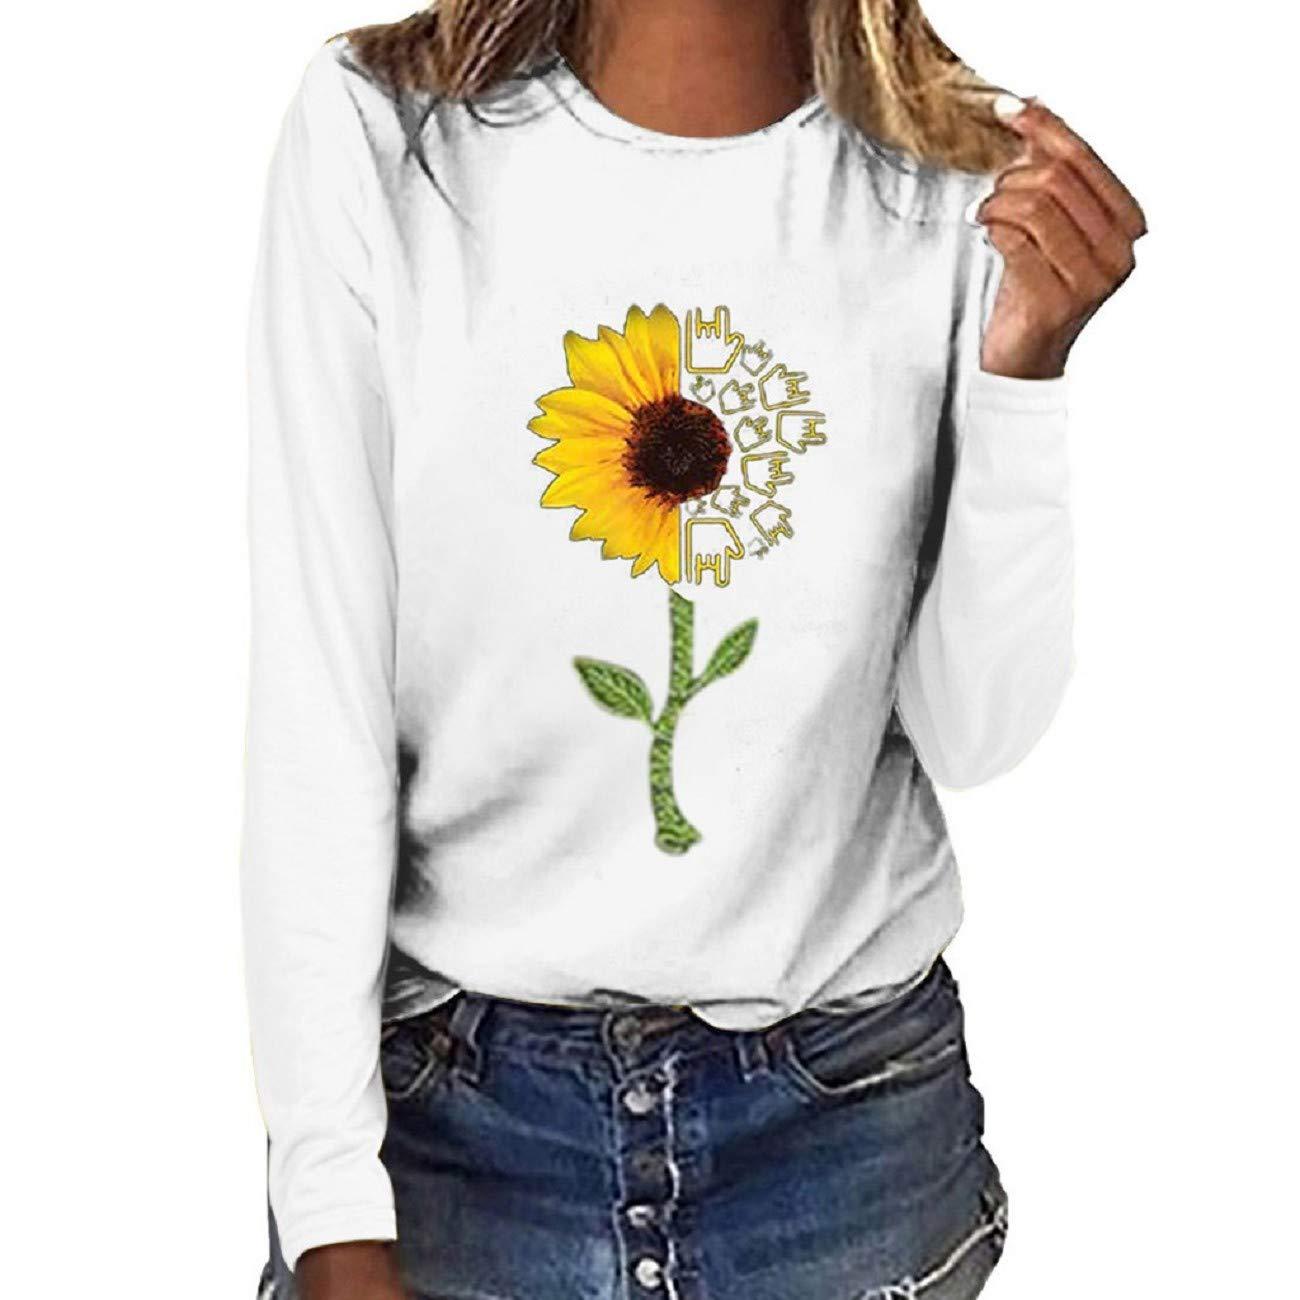 Tsmile Women Plus Size Sweatshirt Fashion Floral Letter Print Round Neck Long Sleeve Casual Fit T-Shirt Blouse Tops